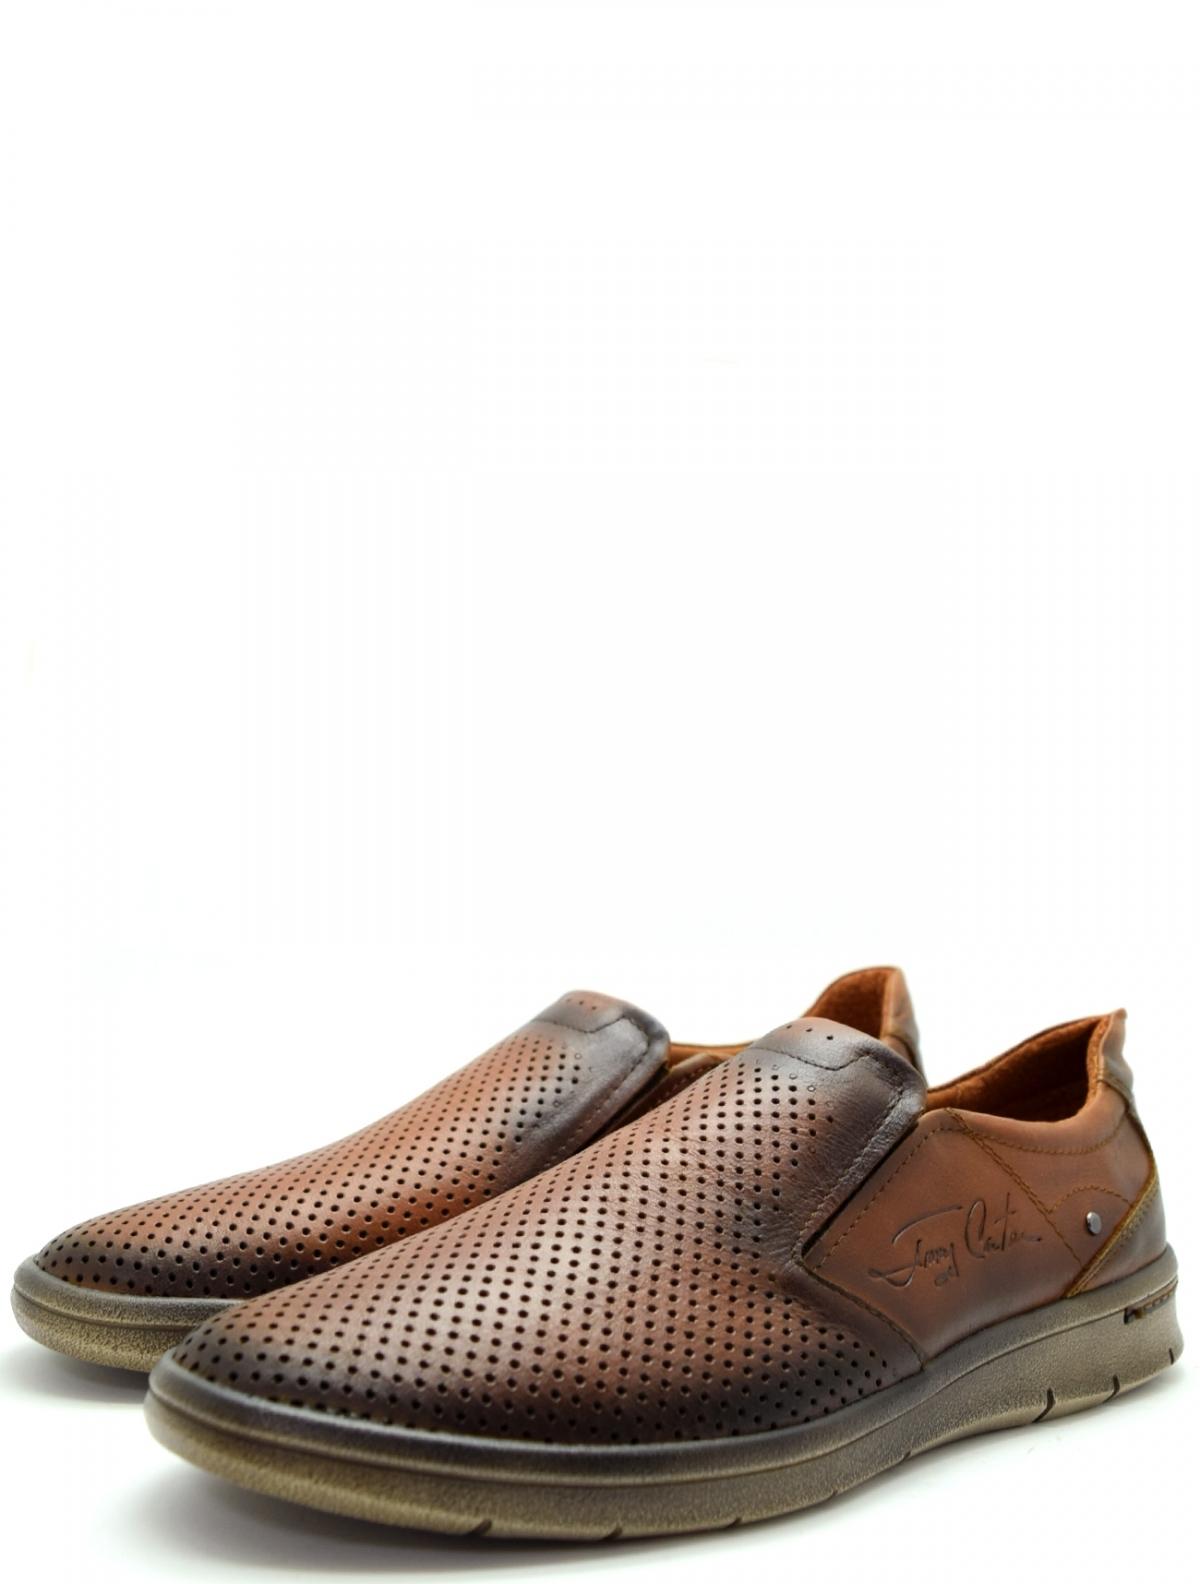 BERTOLI 264/10/9П мужские туфли